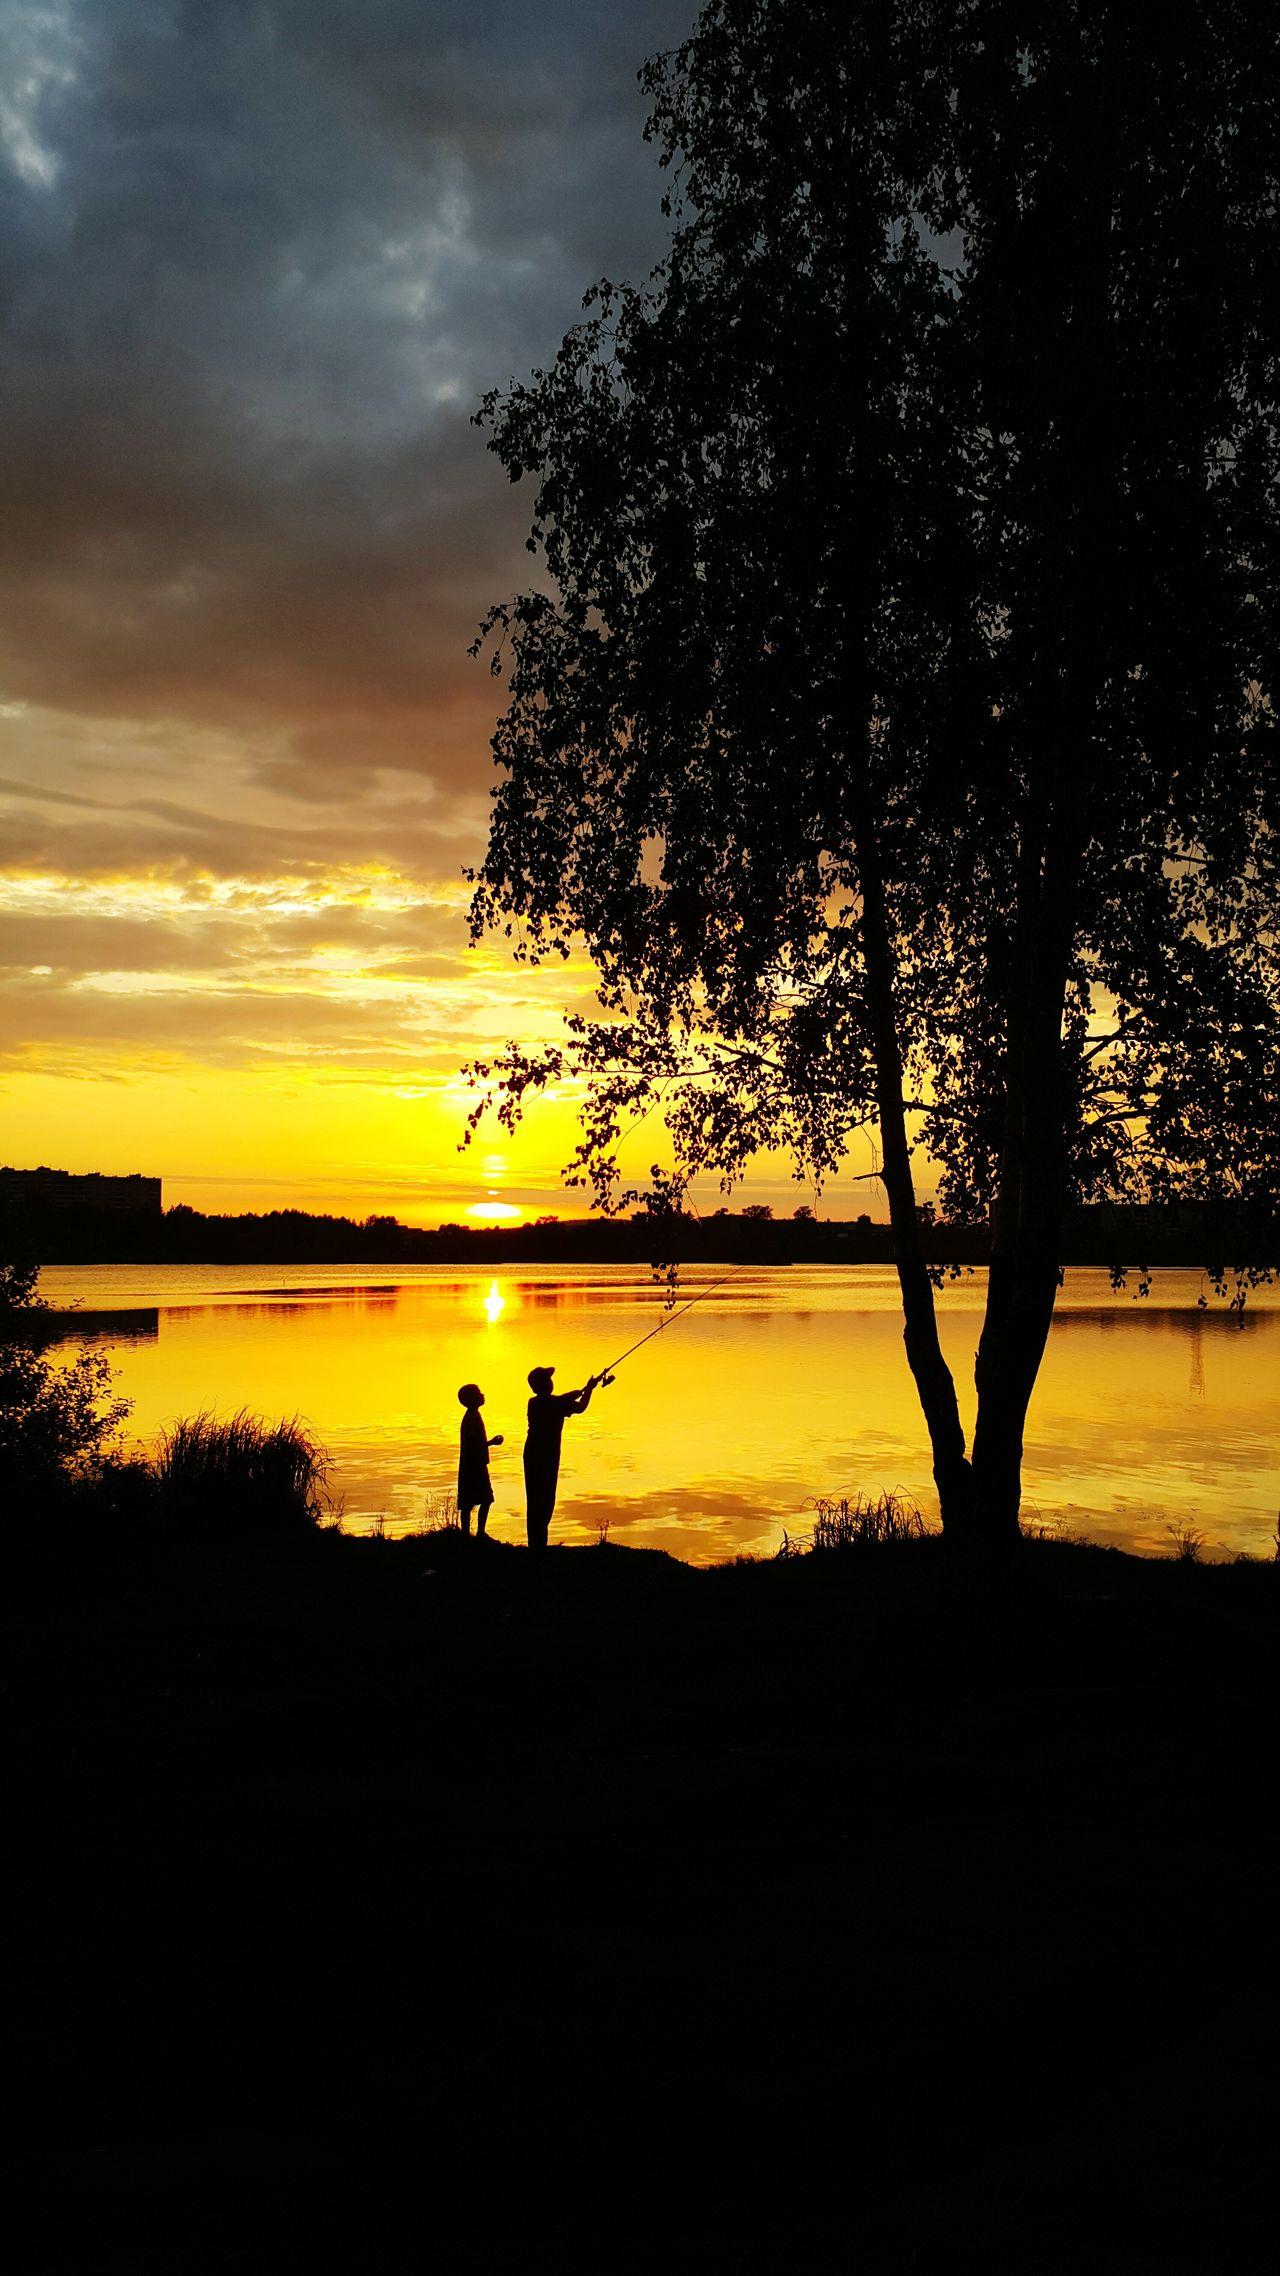 Evening Water Sky Sunset Fishing Good Night @Shedu_photo 📱